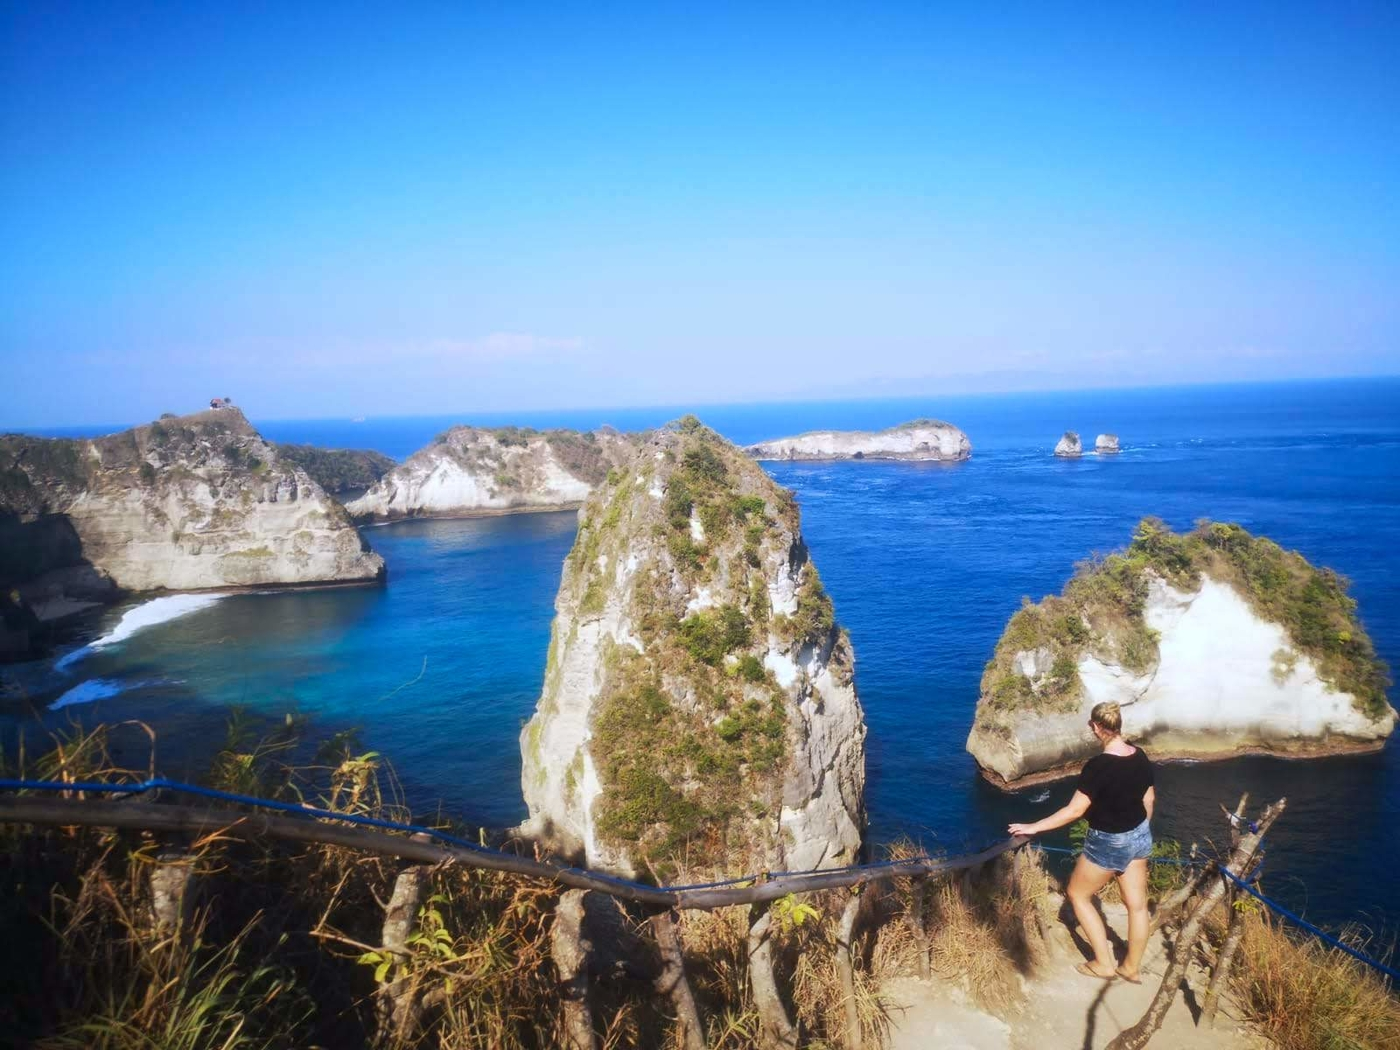 nusa penida at thousand island viewpoint.jpg